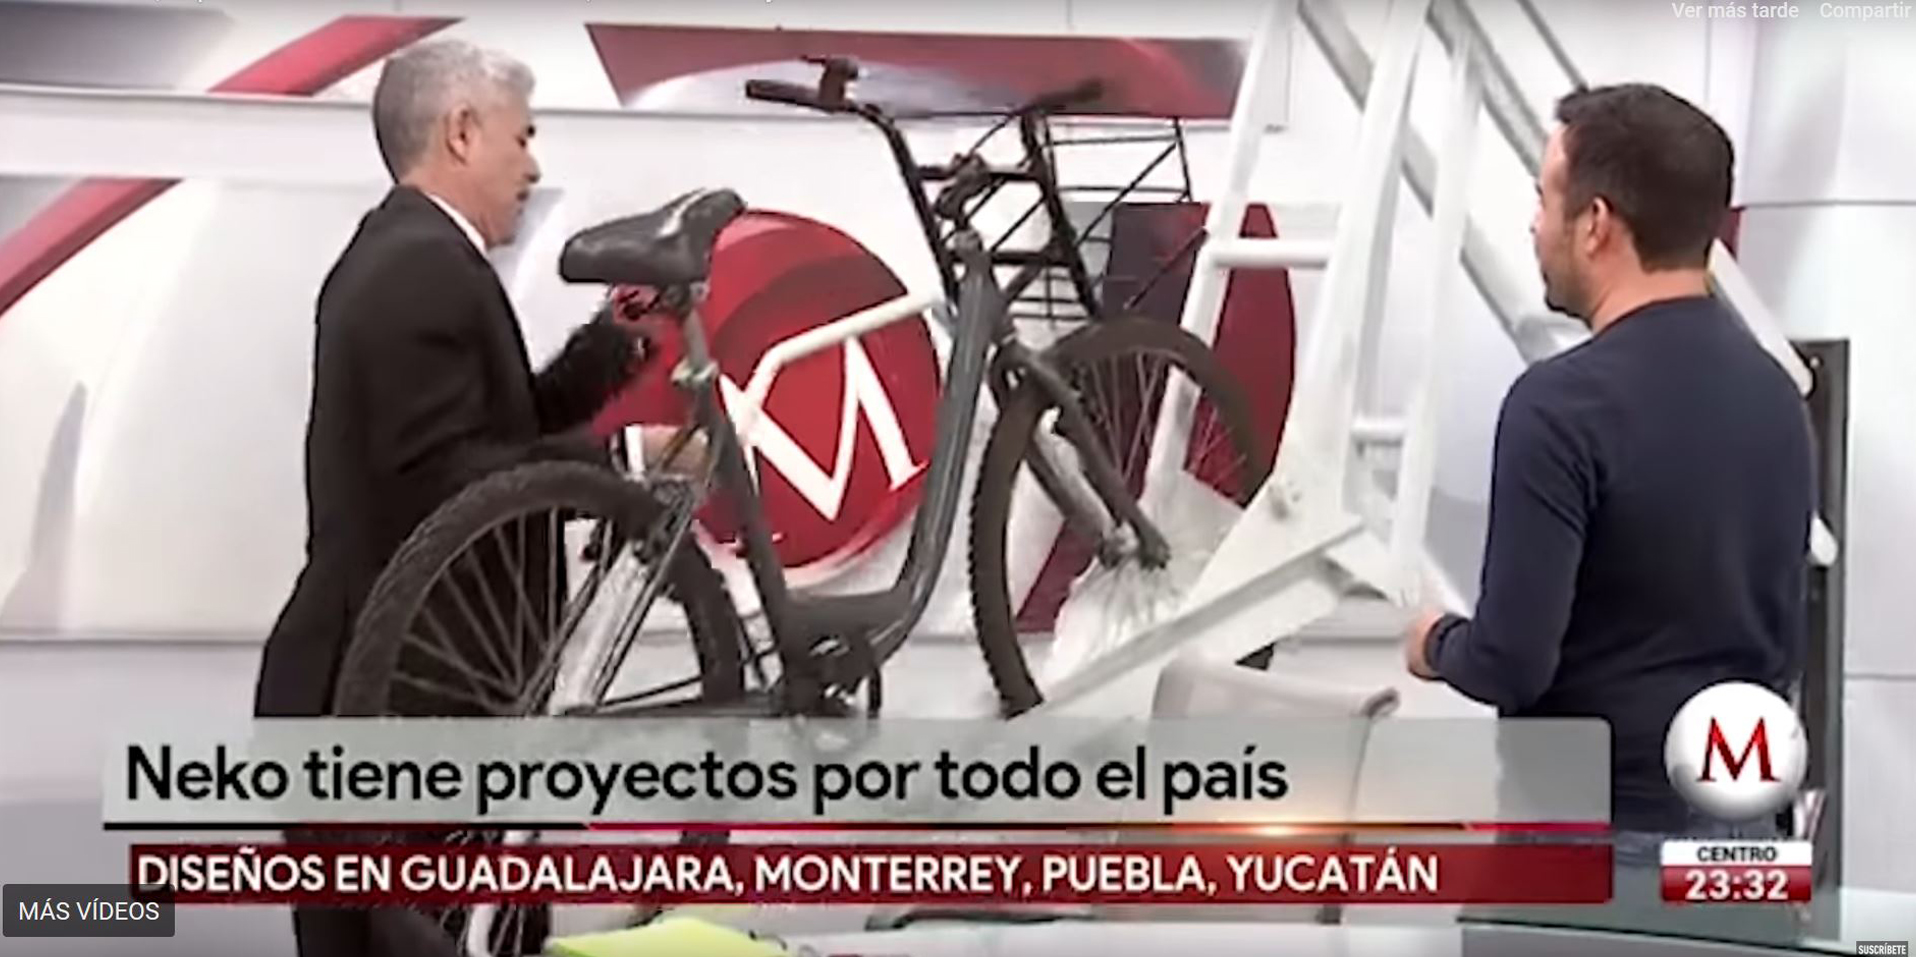 Milenio_Hector_Zamarron_Entrevista-Neko